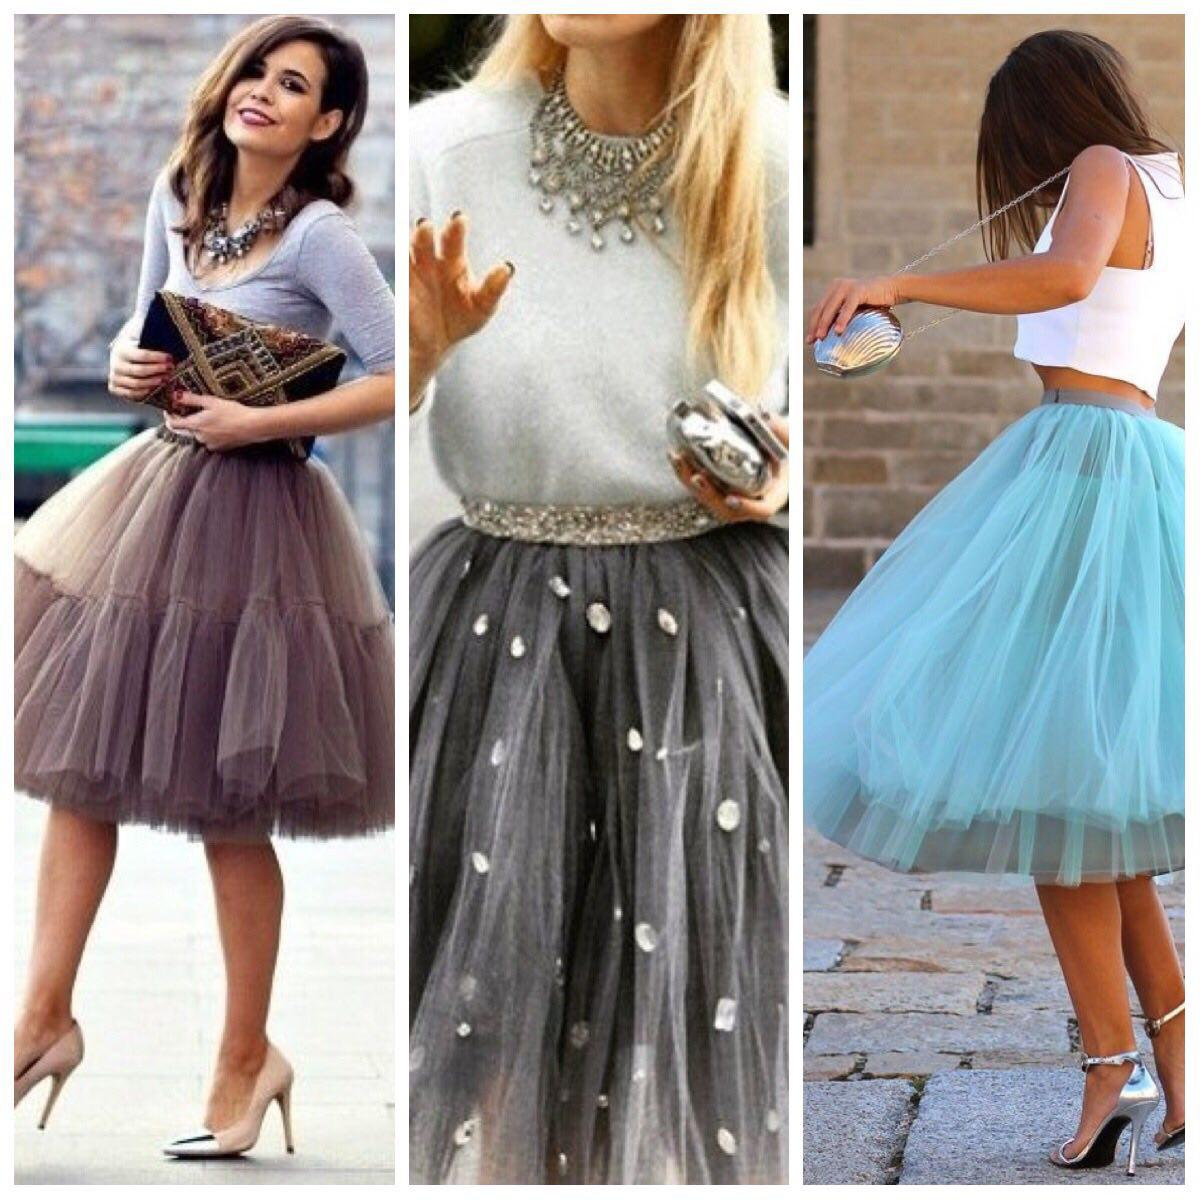 С чем носить юбку-пачку